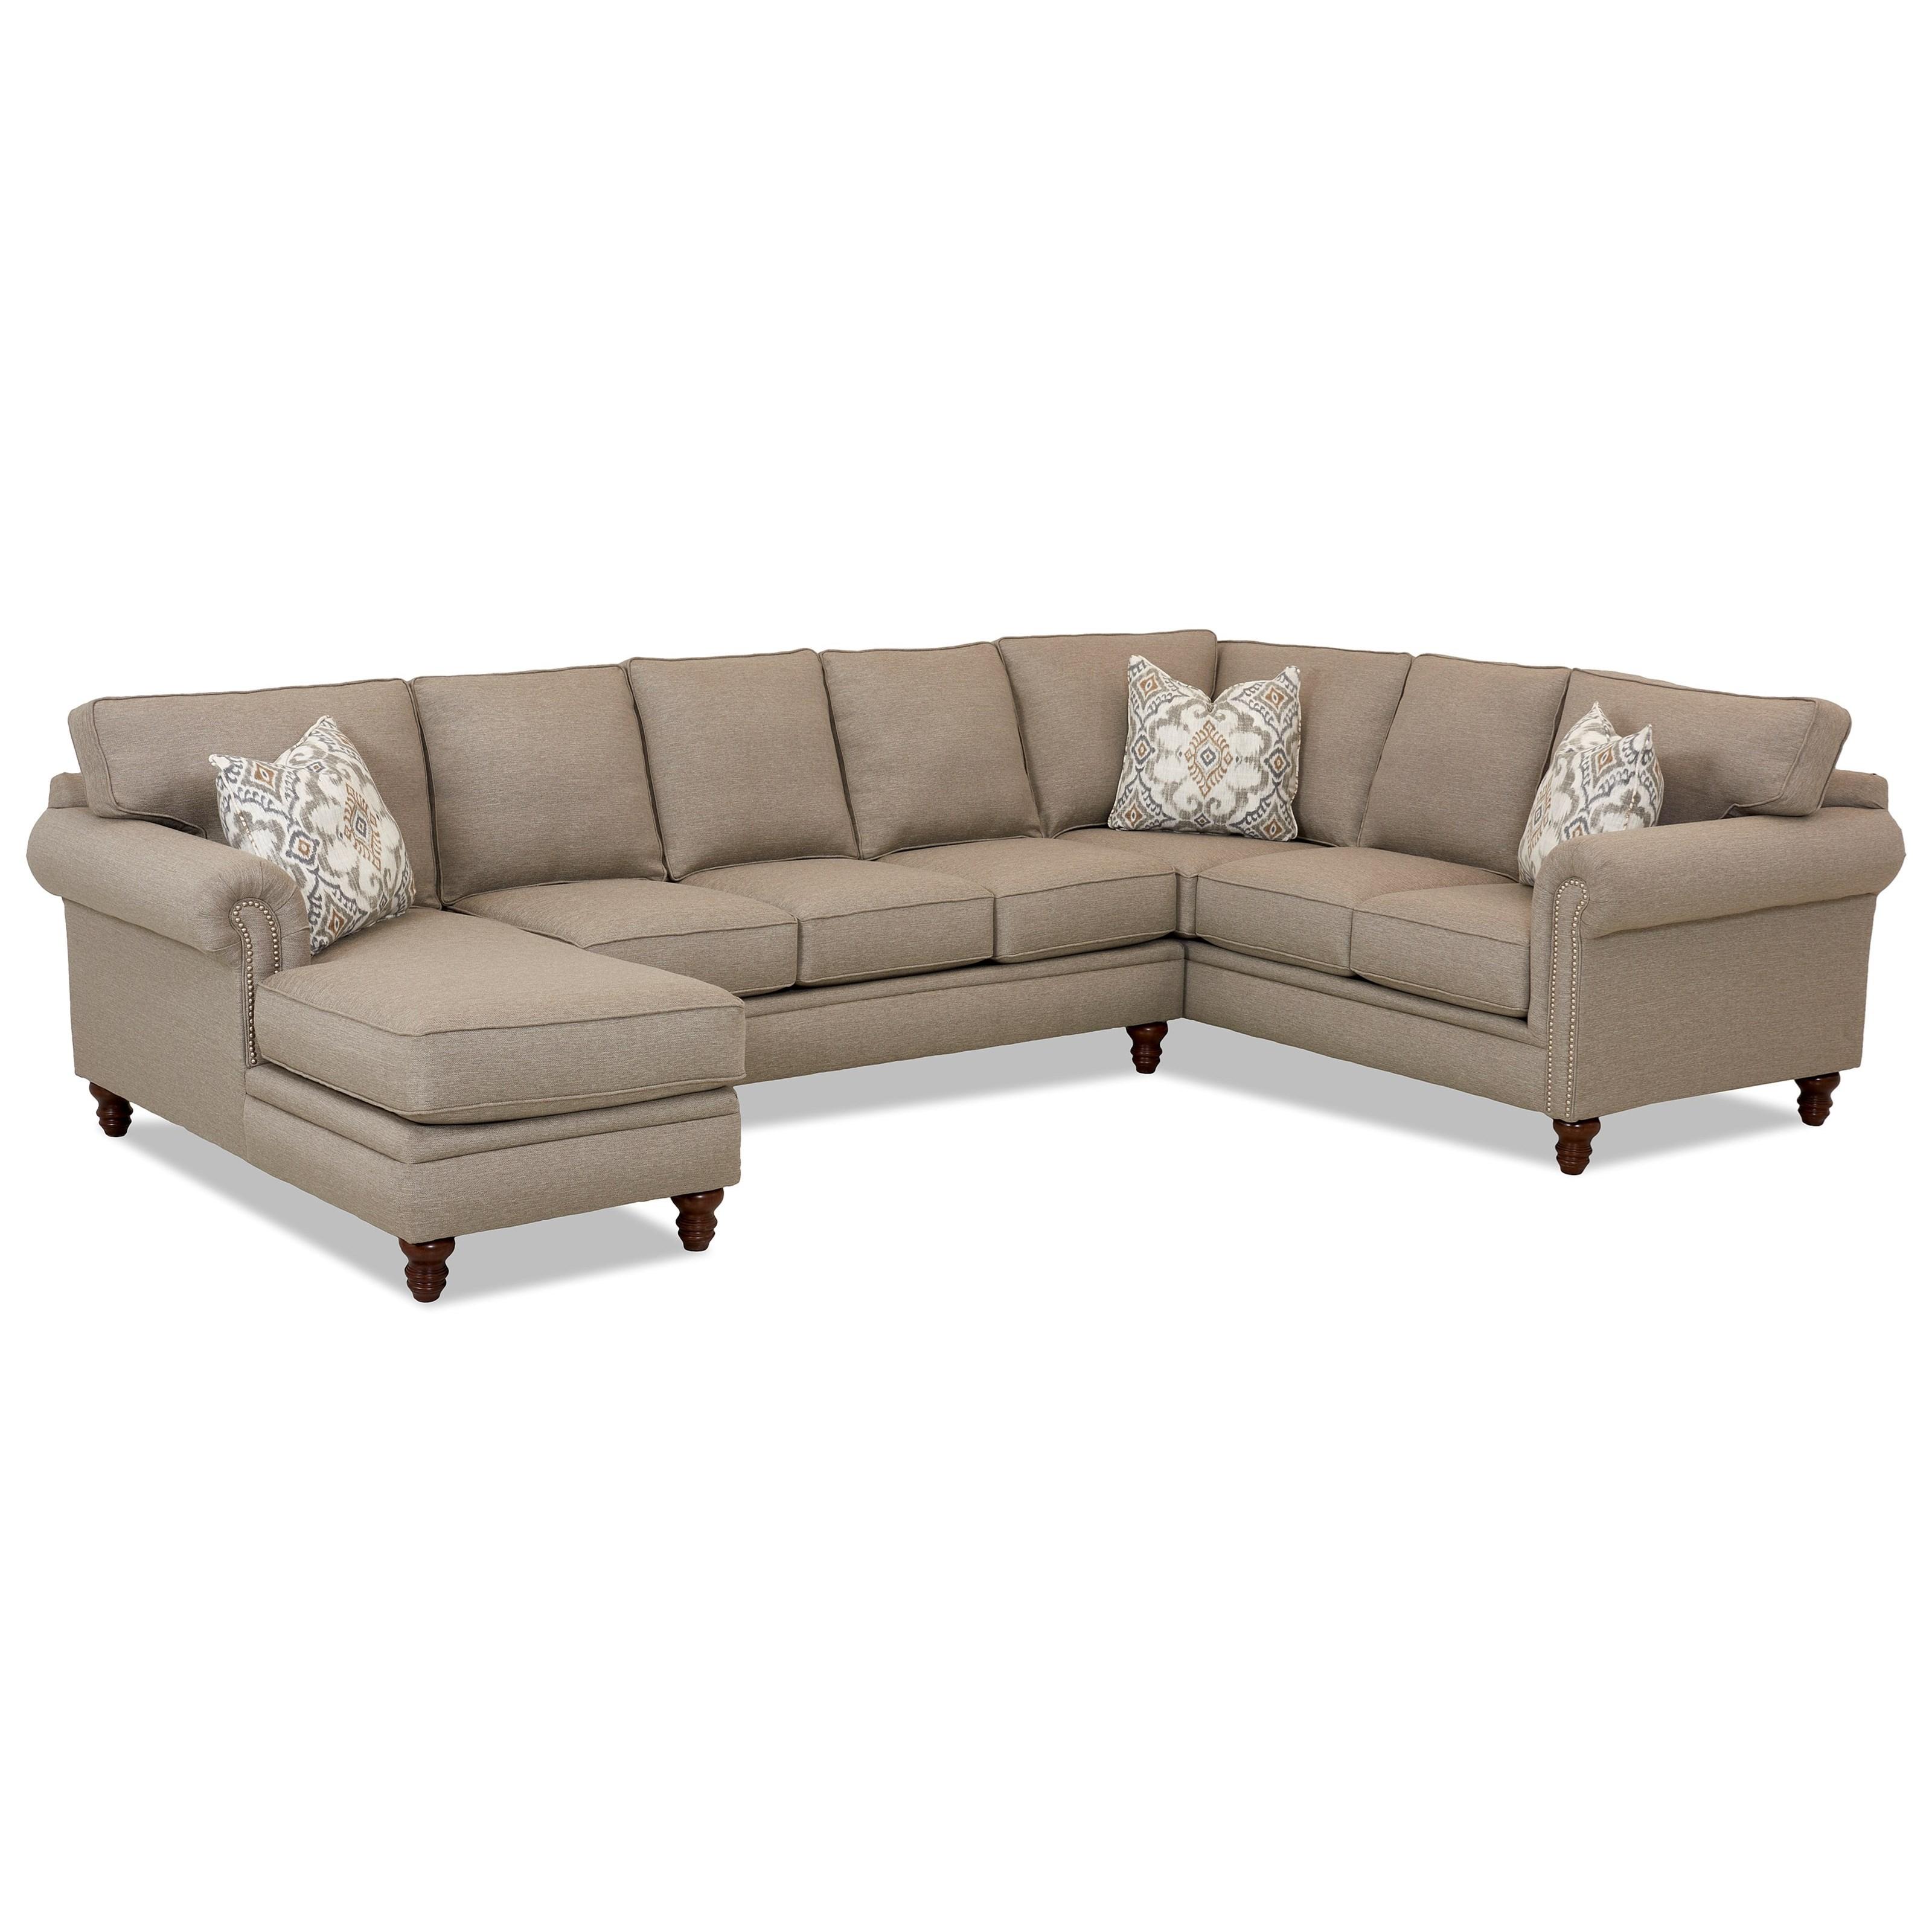 Merveilleux Klaussner Carter3 Pc Sectional Sofa ...